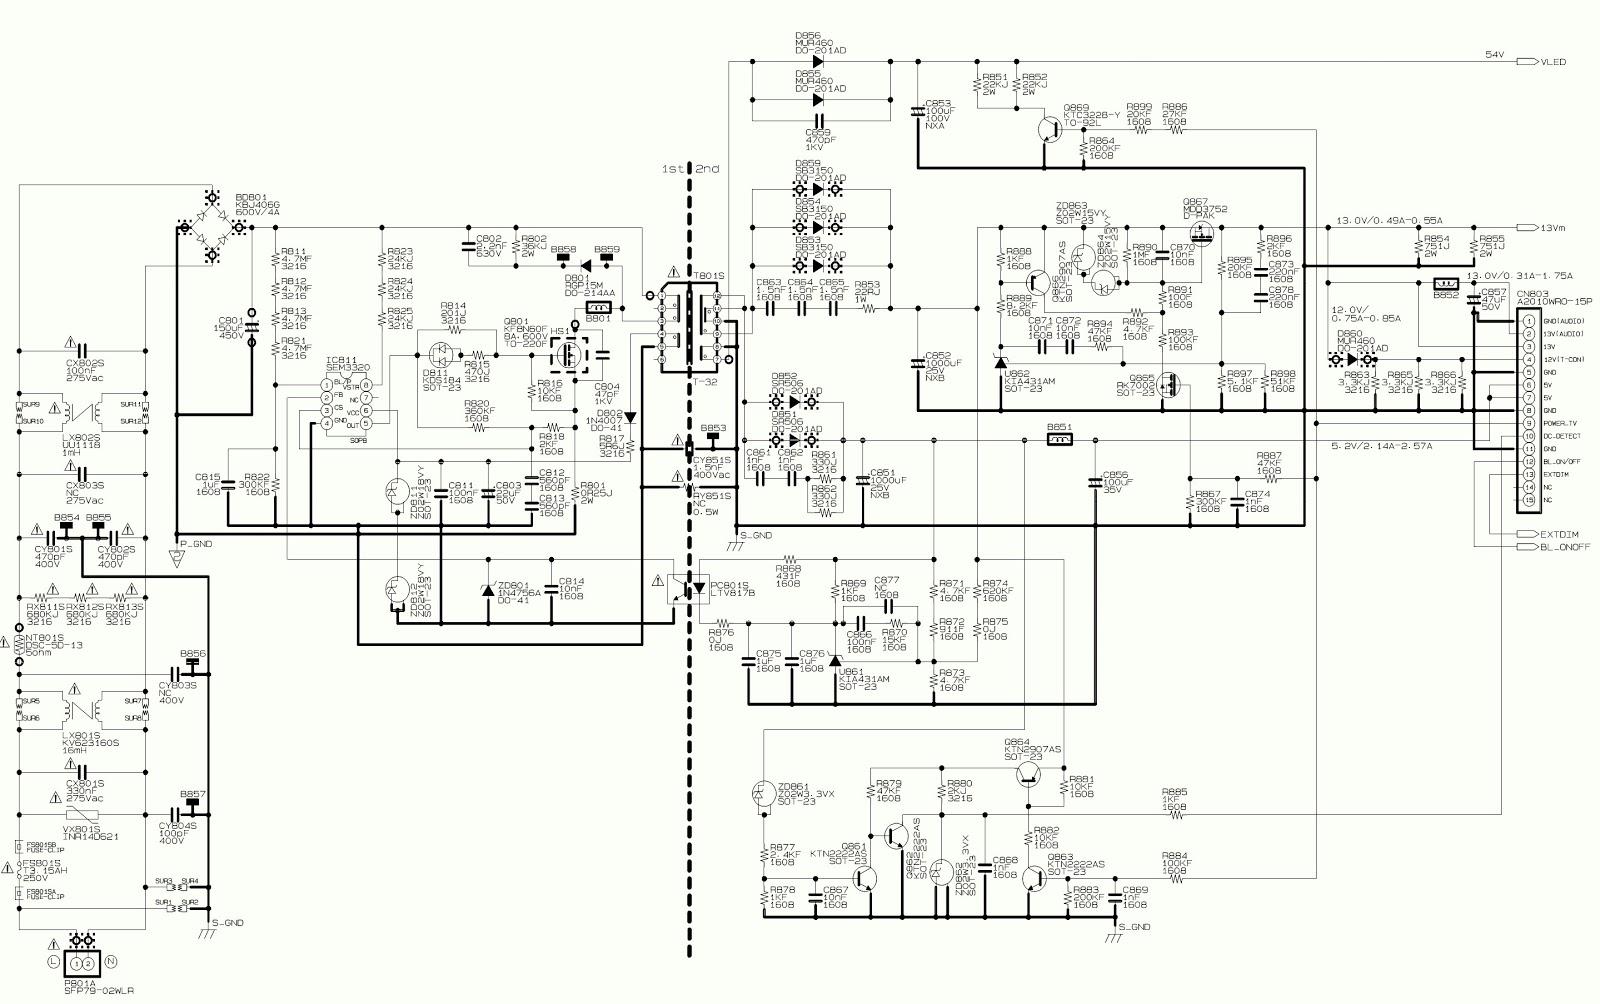 toshiba 39l2300  u2013 toshiba 32l2300  u2013 smps circuit diagram